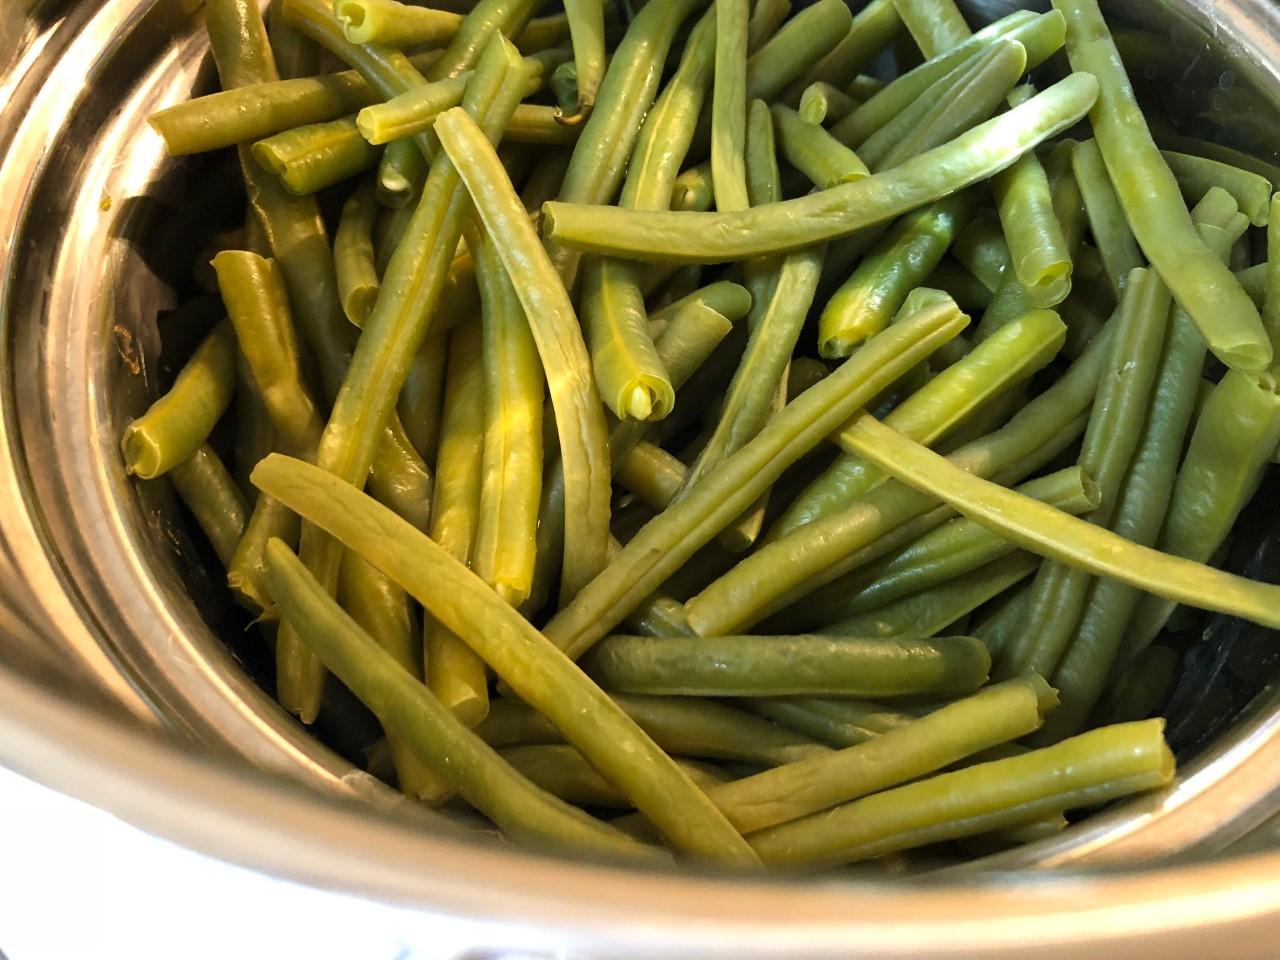 tegoline cotte al vapore - Fagiolini e pancetta